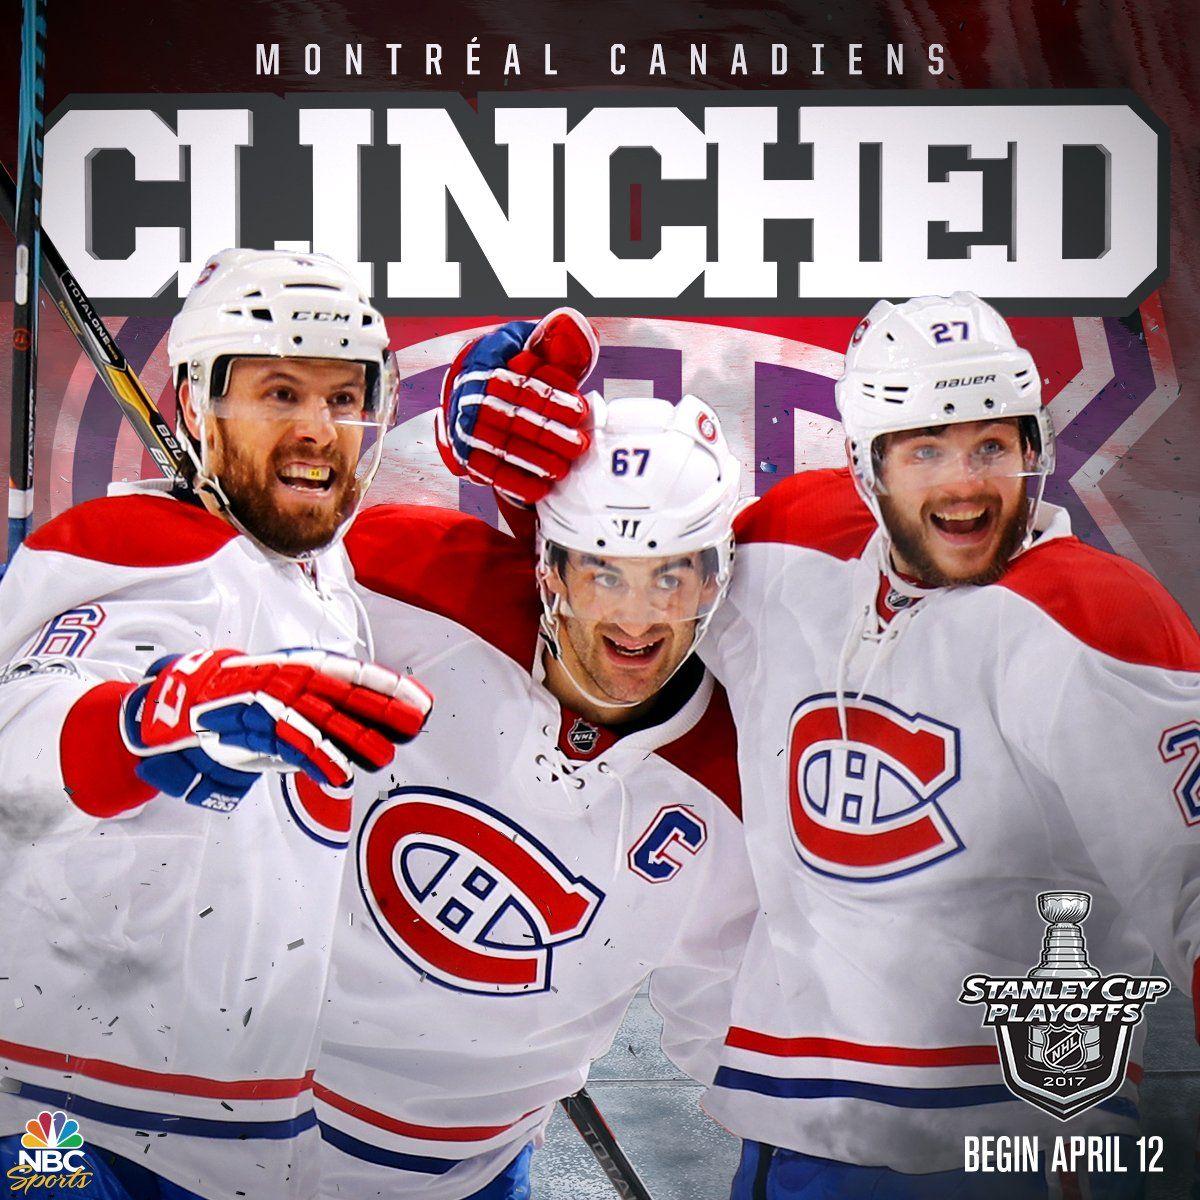 GOHABSGO 2017 Playoffs Montreal canadians, Canadiens